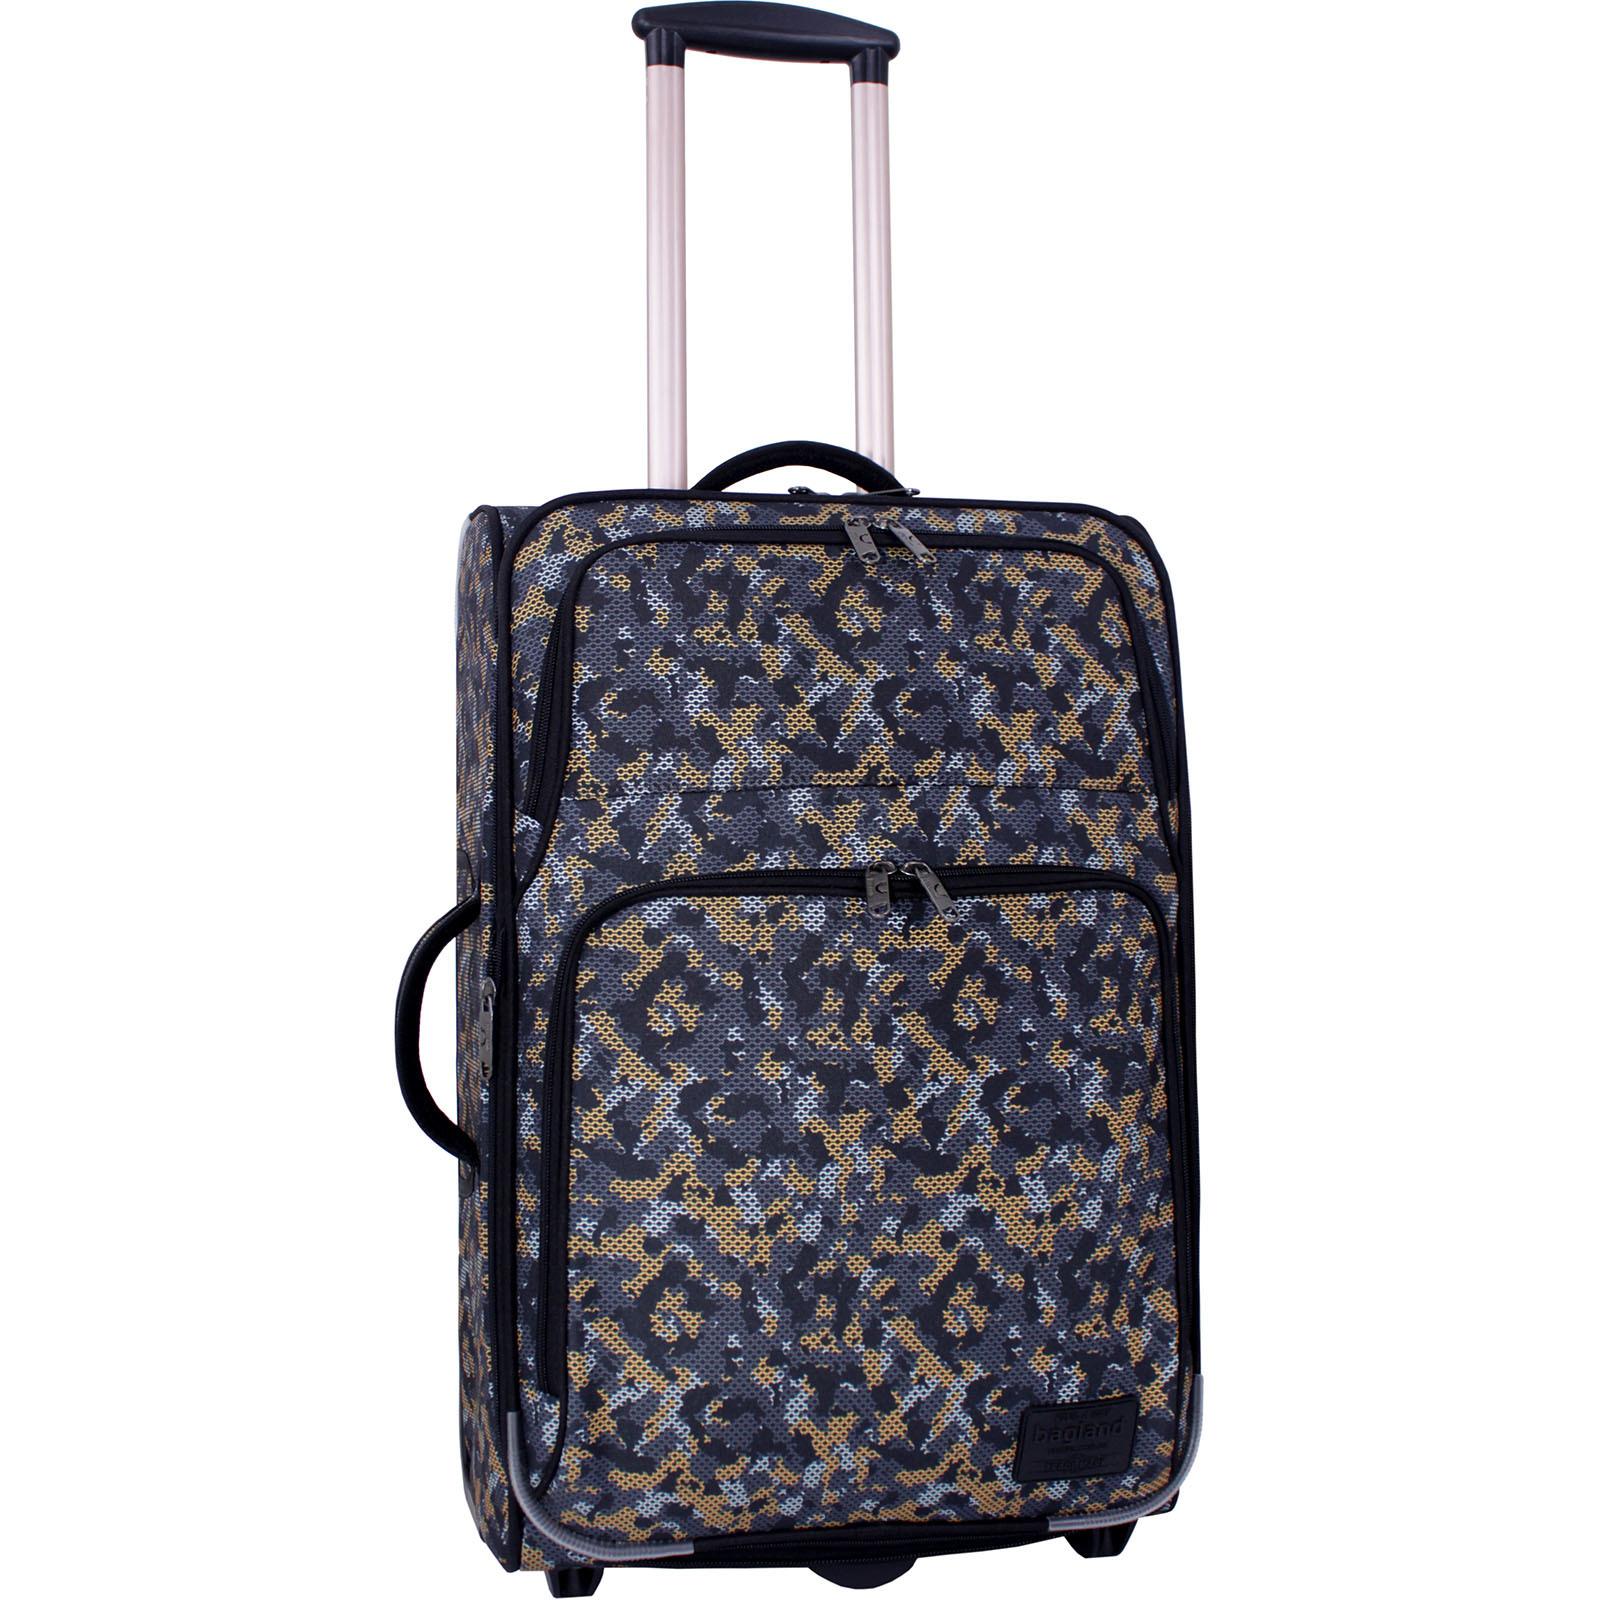 Дорожные чемоданы Чемодан Bagland Леон средний дизайн 51 л. сублімація 455 (0037666244) IMG_4852_суб.455_.JPG